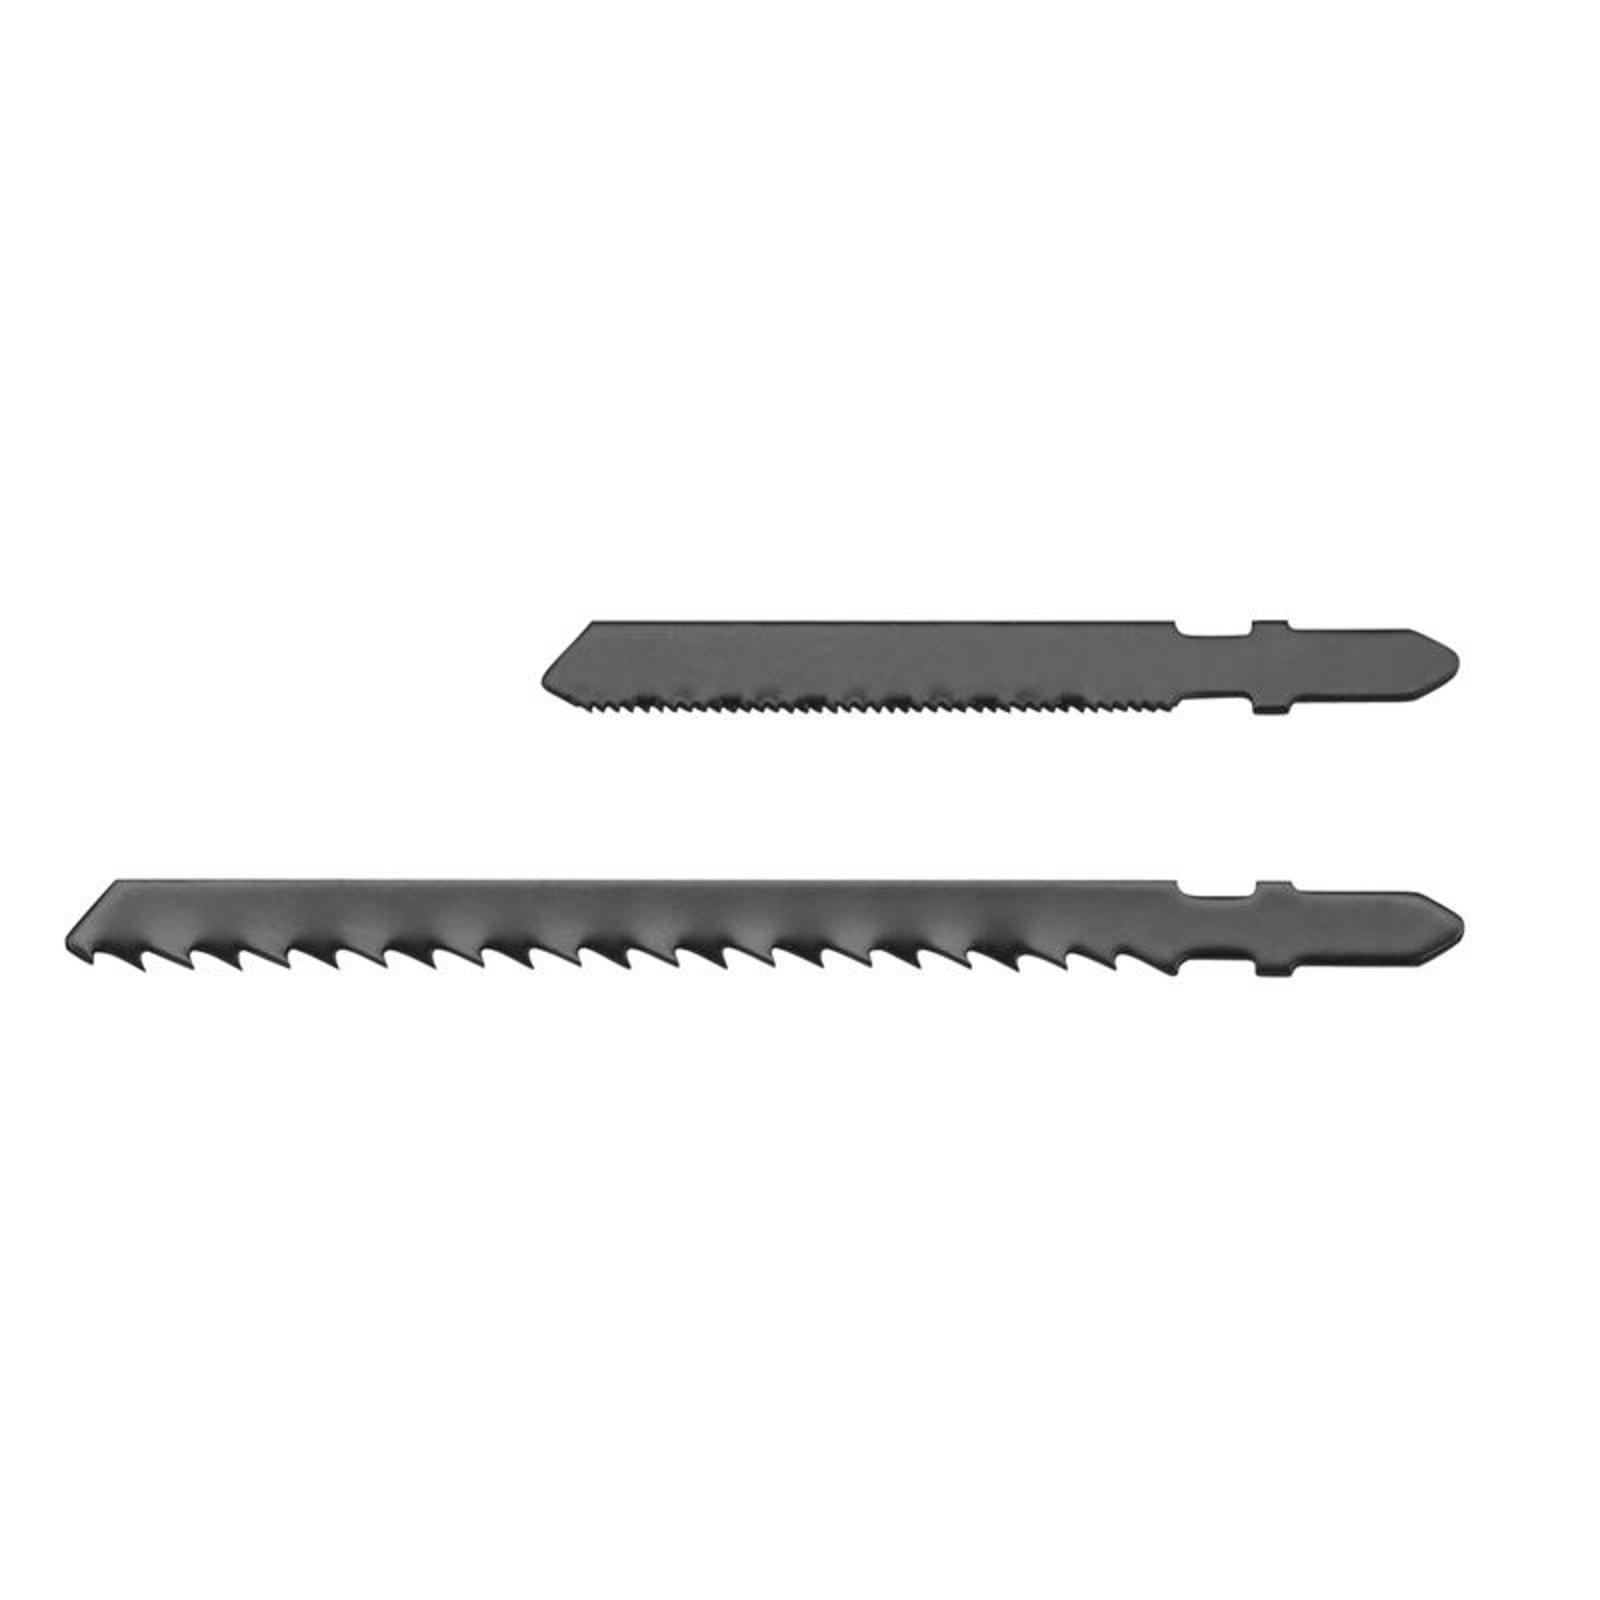 Craftsman C3 19.2-Volt Jig Saw with Laser Trac